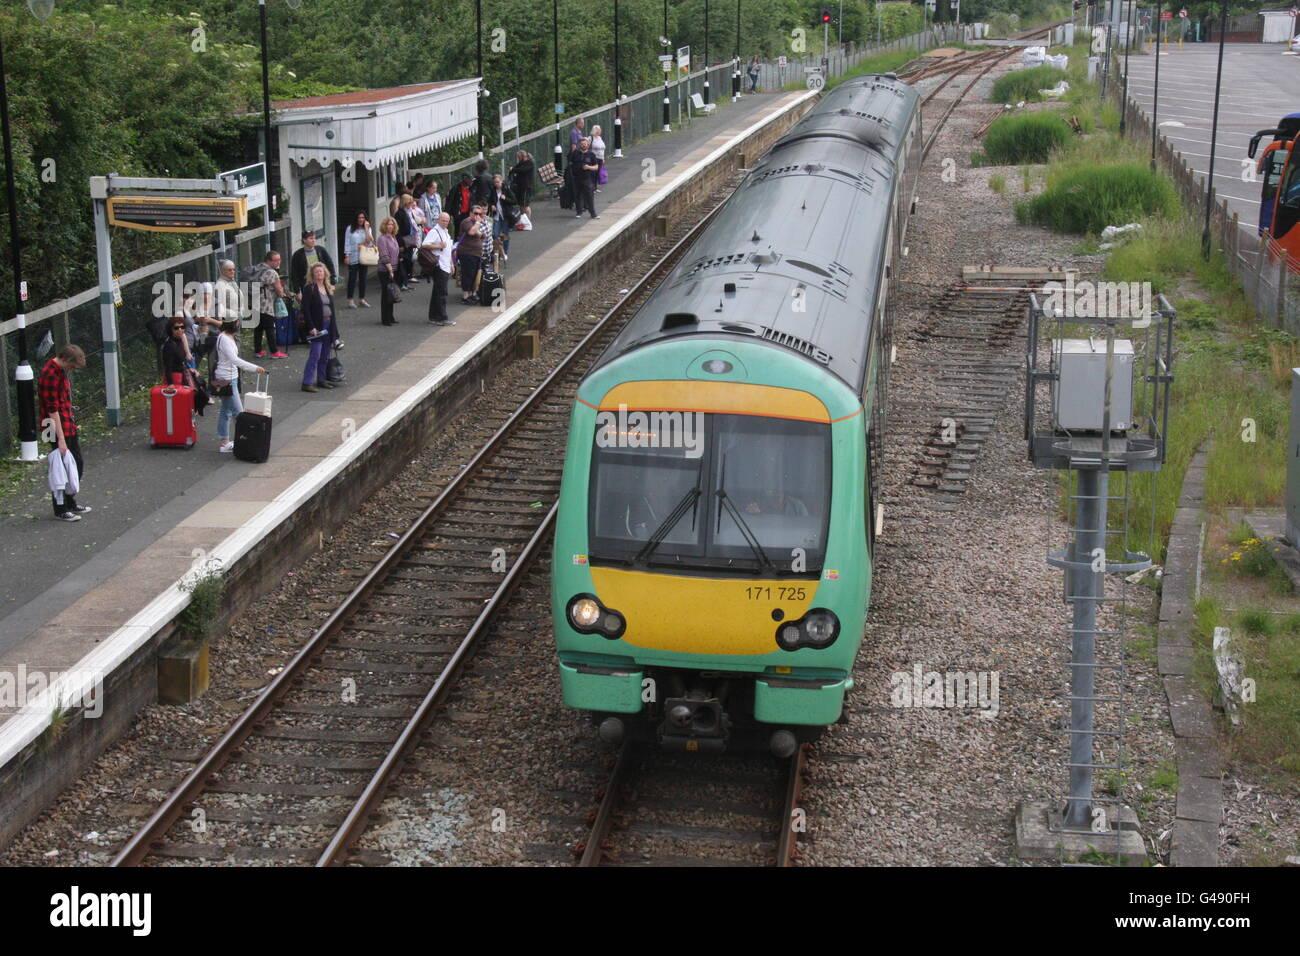 A SOUTHERN RAILWAY TRAIN ENTERING A RAILWAY STATION PLATFORM - Stock Image